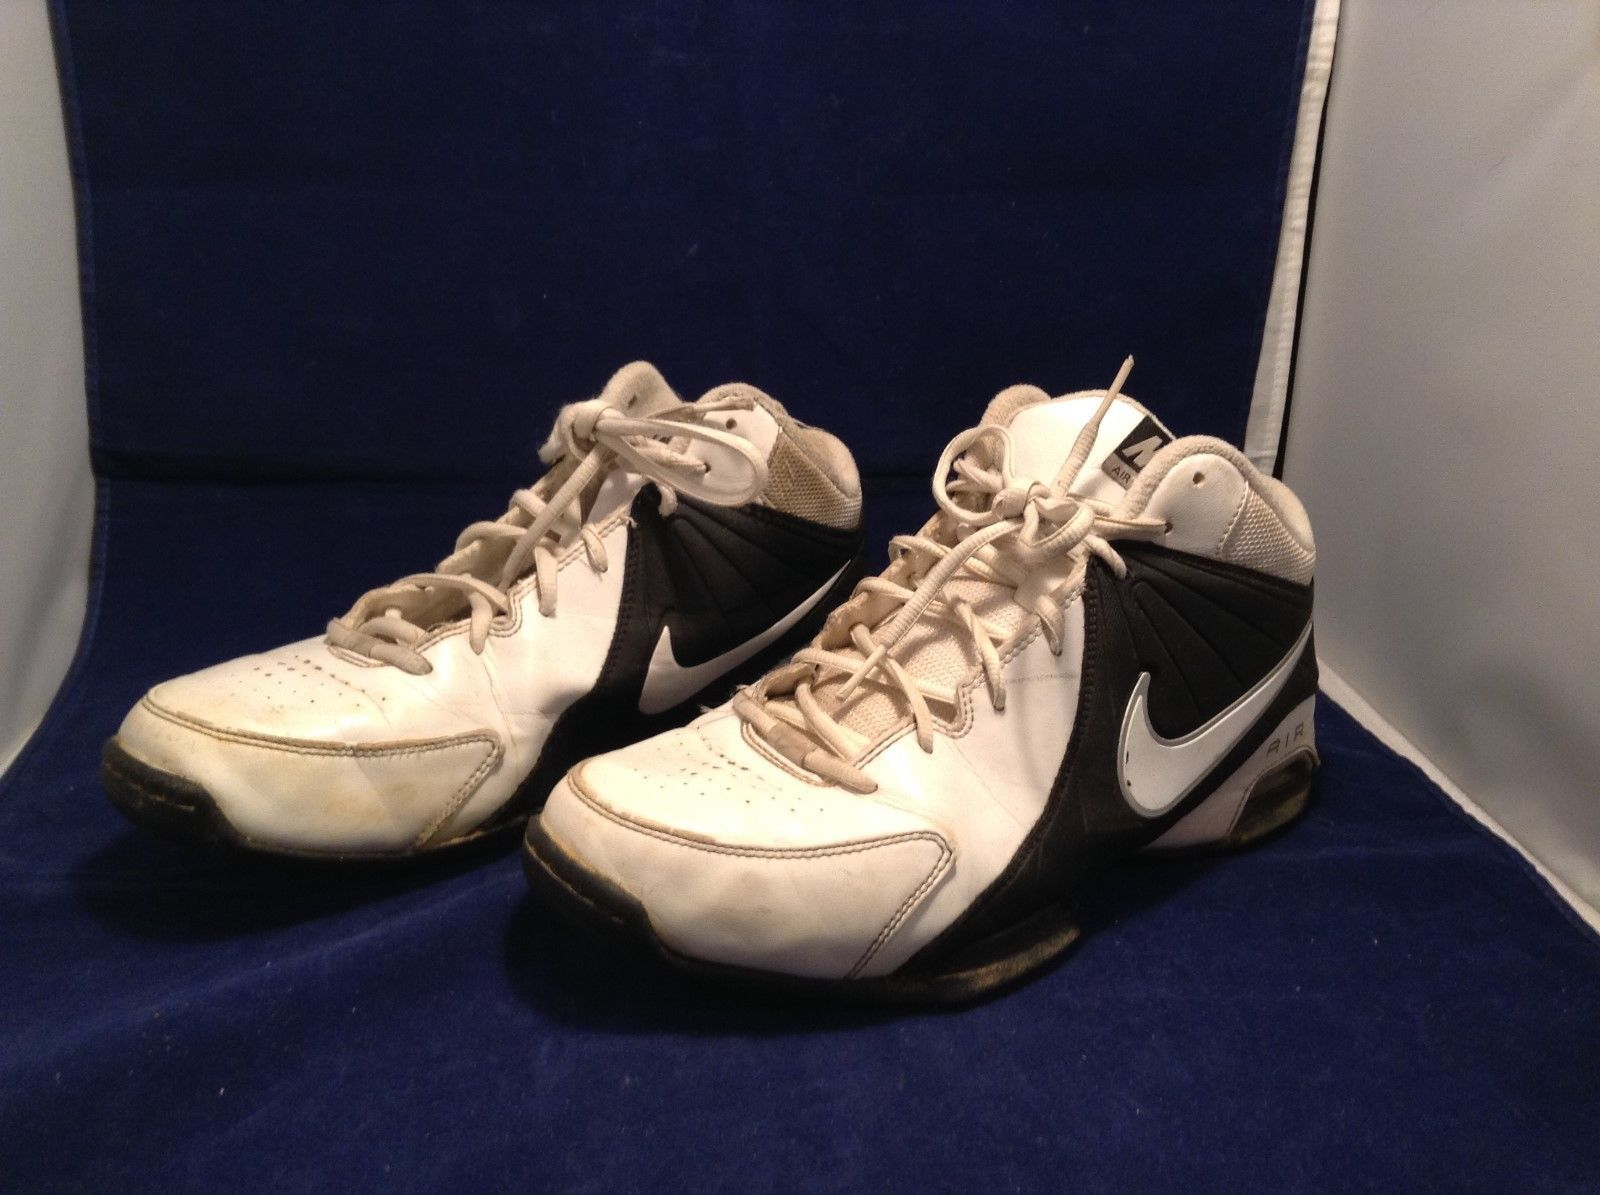 Men's Nike Air Visi Pro White/Black Basketball Shoes Sz 10